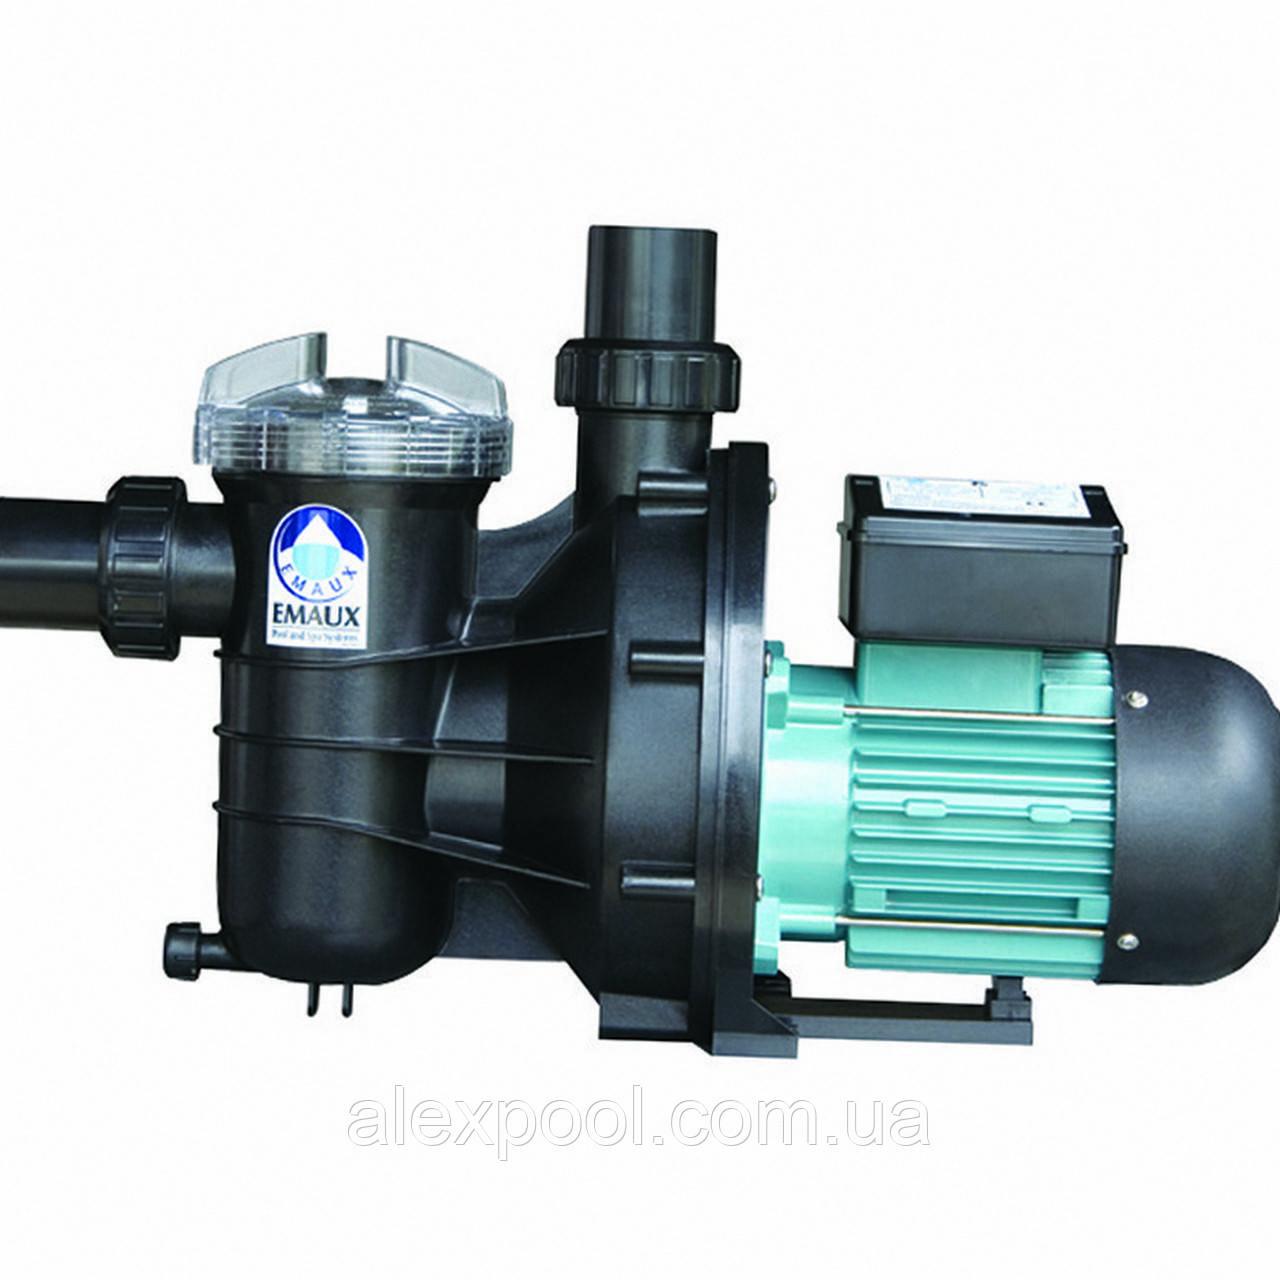 Насос Emaux SS033 для приватних басейнів ( SS 033, 7 м. куб/год, 0,43 кВт, 0,33 HP, 220В )